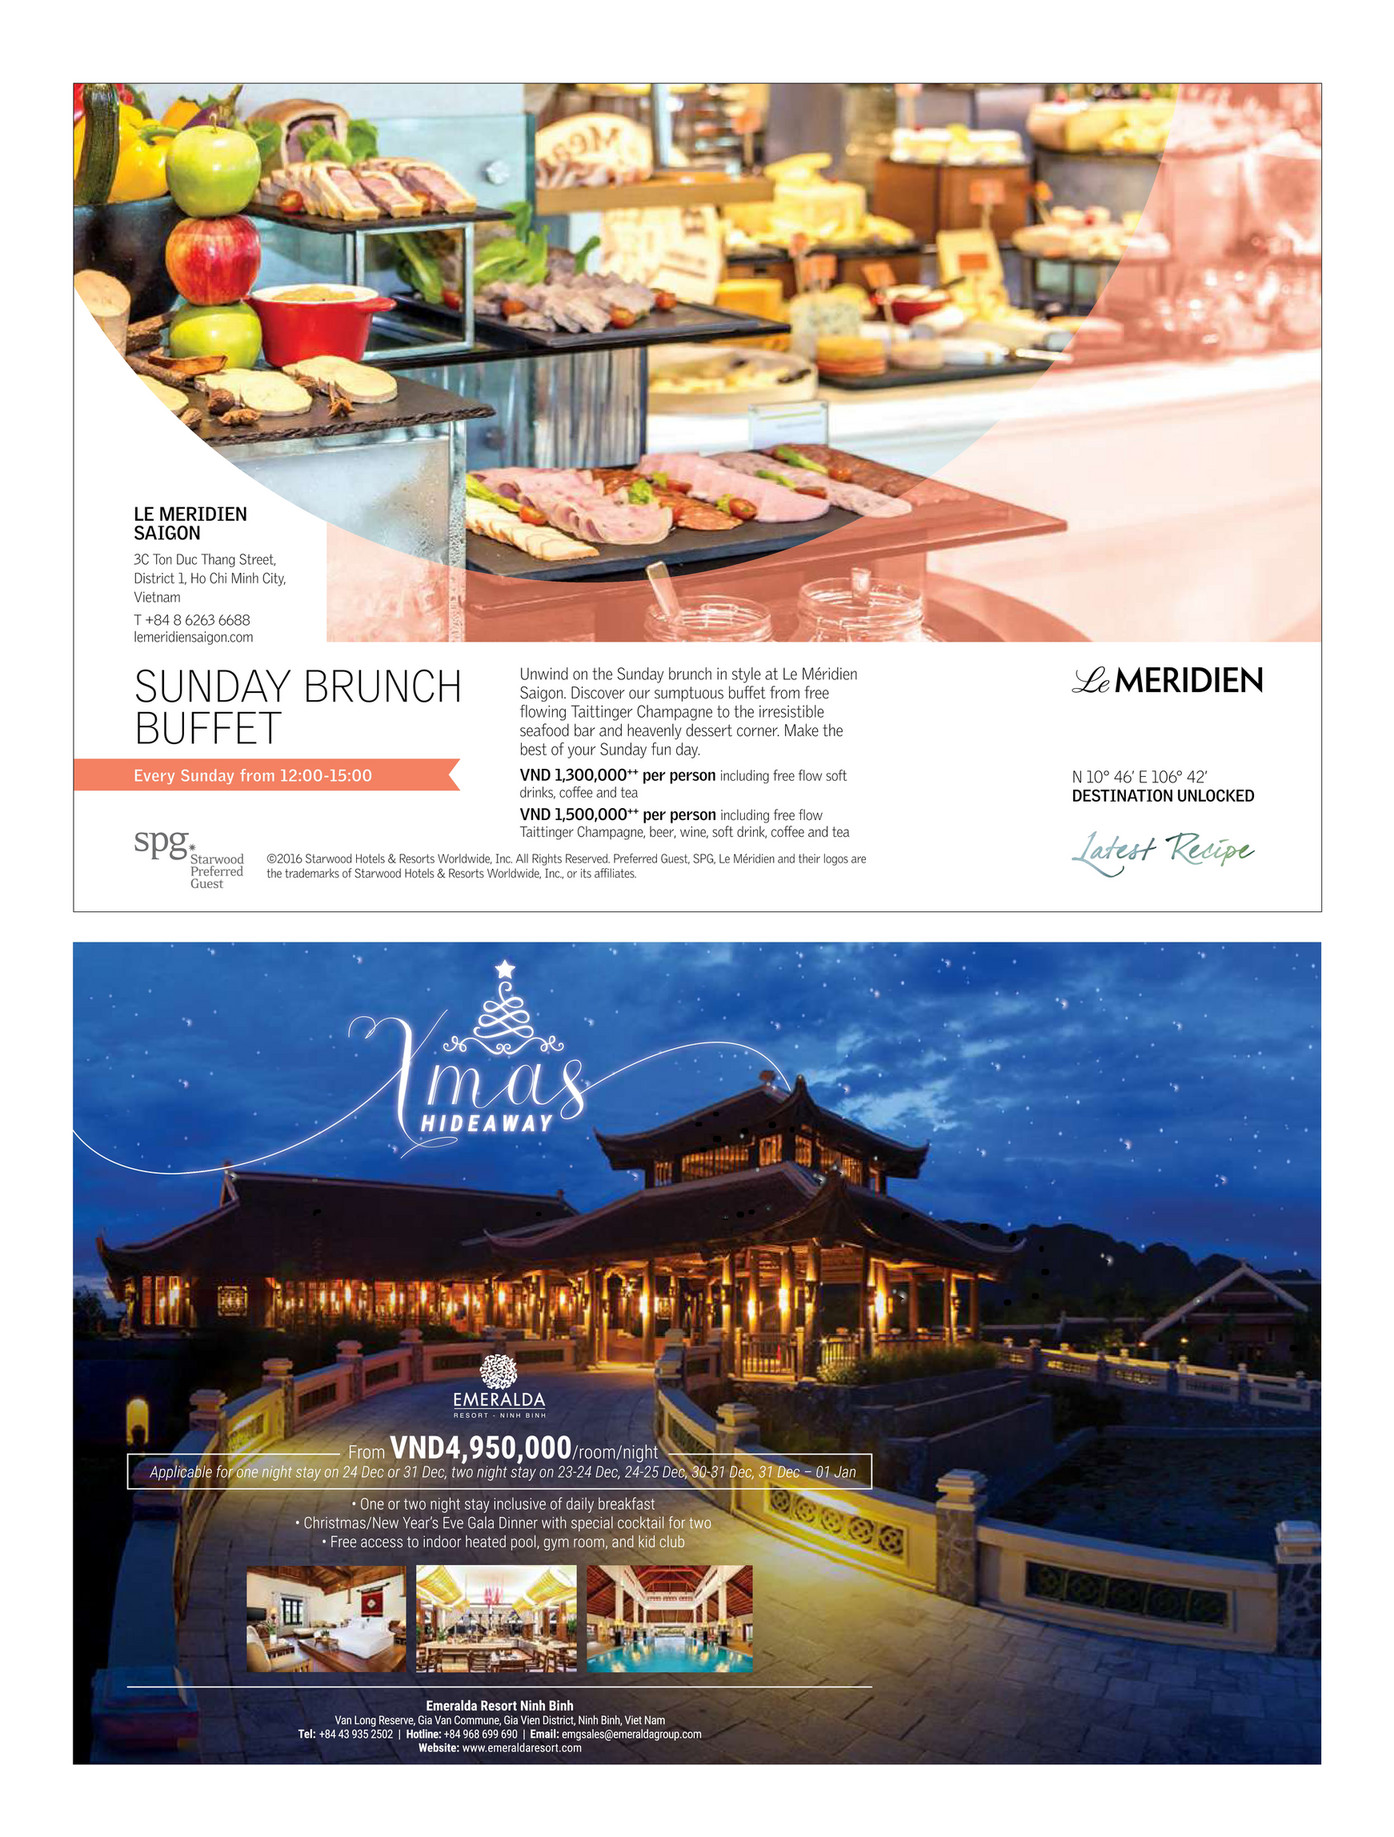 travellive magazine travellive 11 2016 page 40 41 created 41